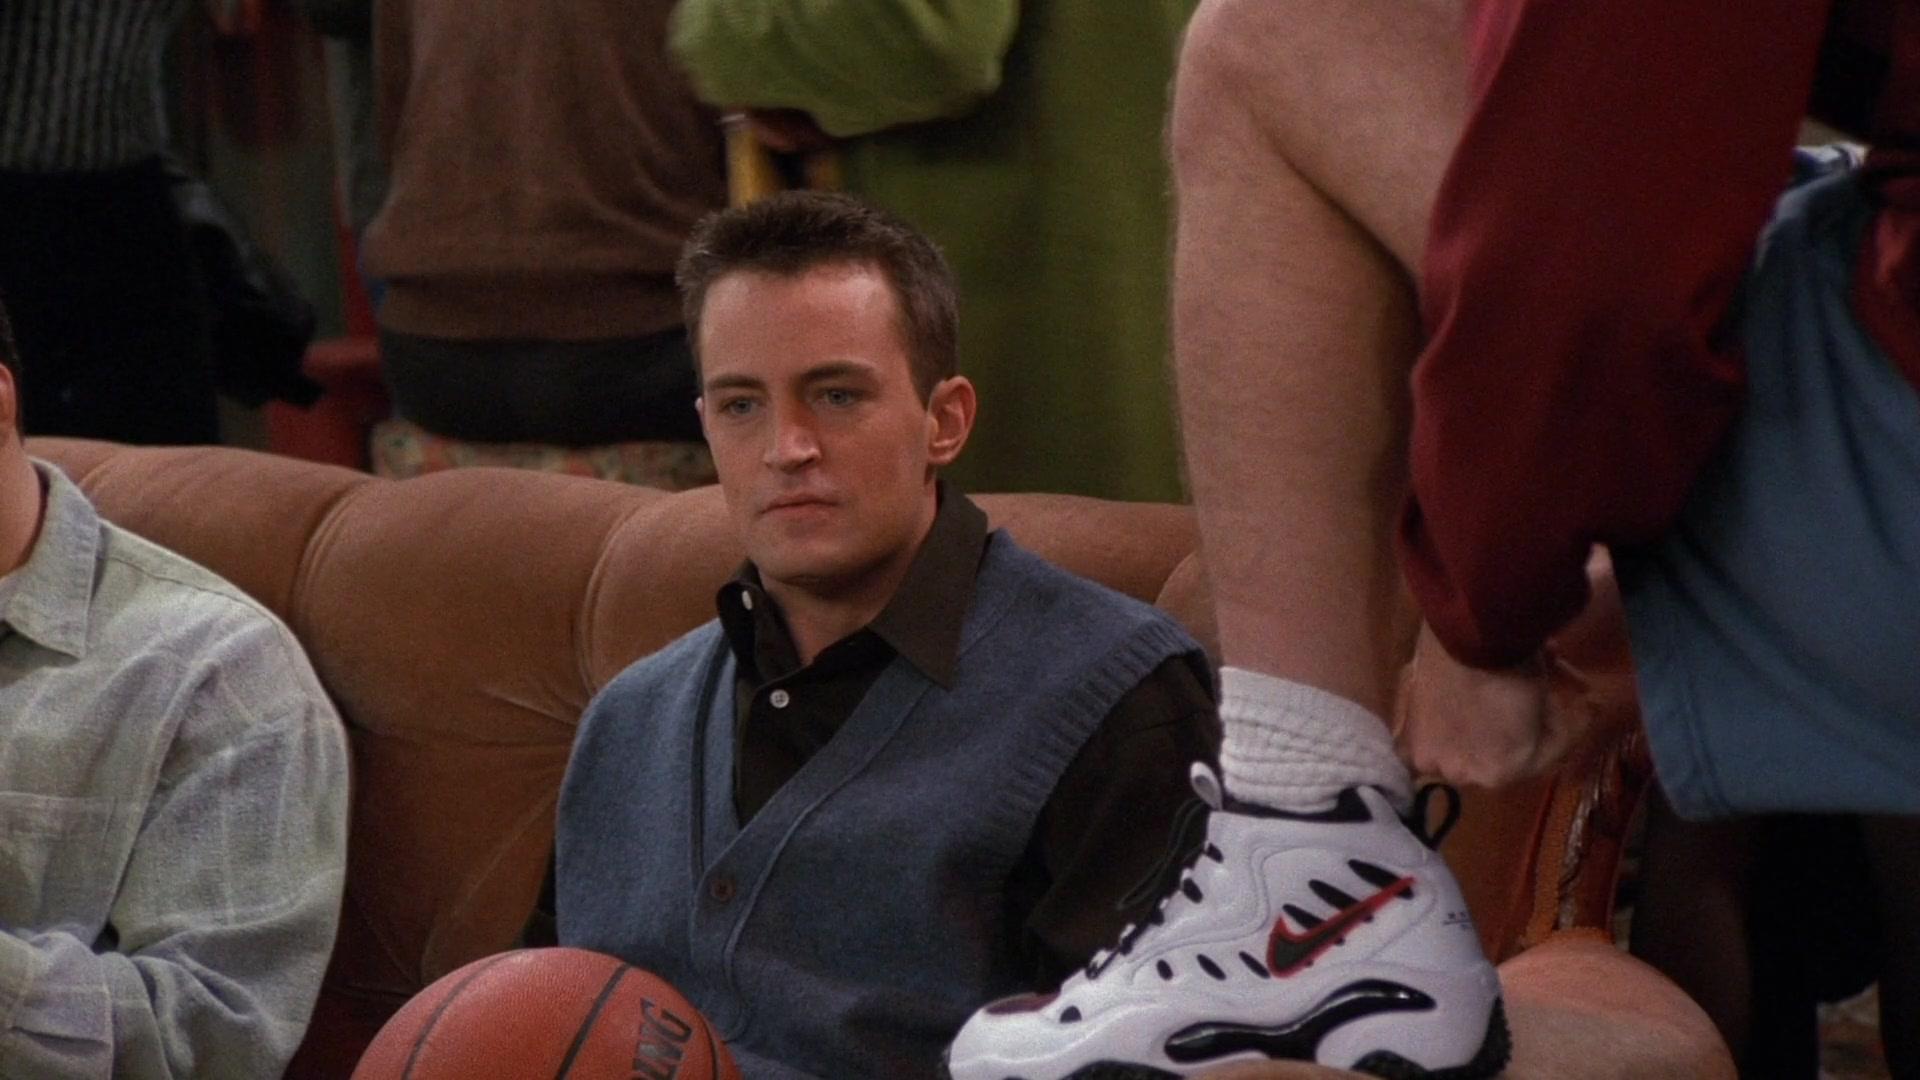 Nike Men's Sneakers Worn by Markus Flanagan (Robert) in Friends